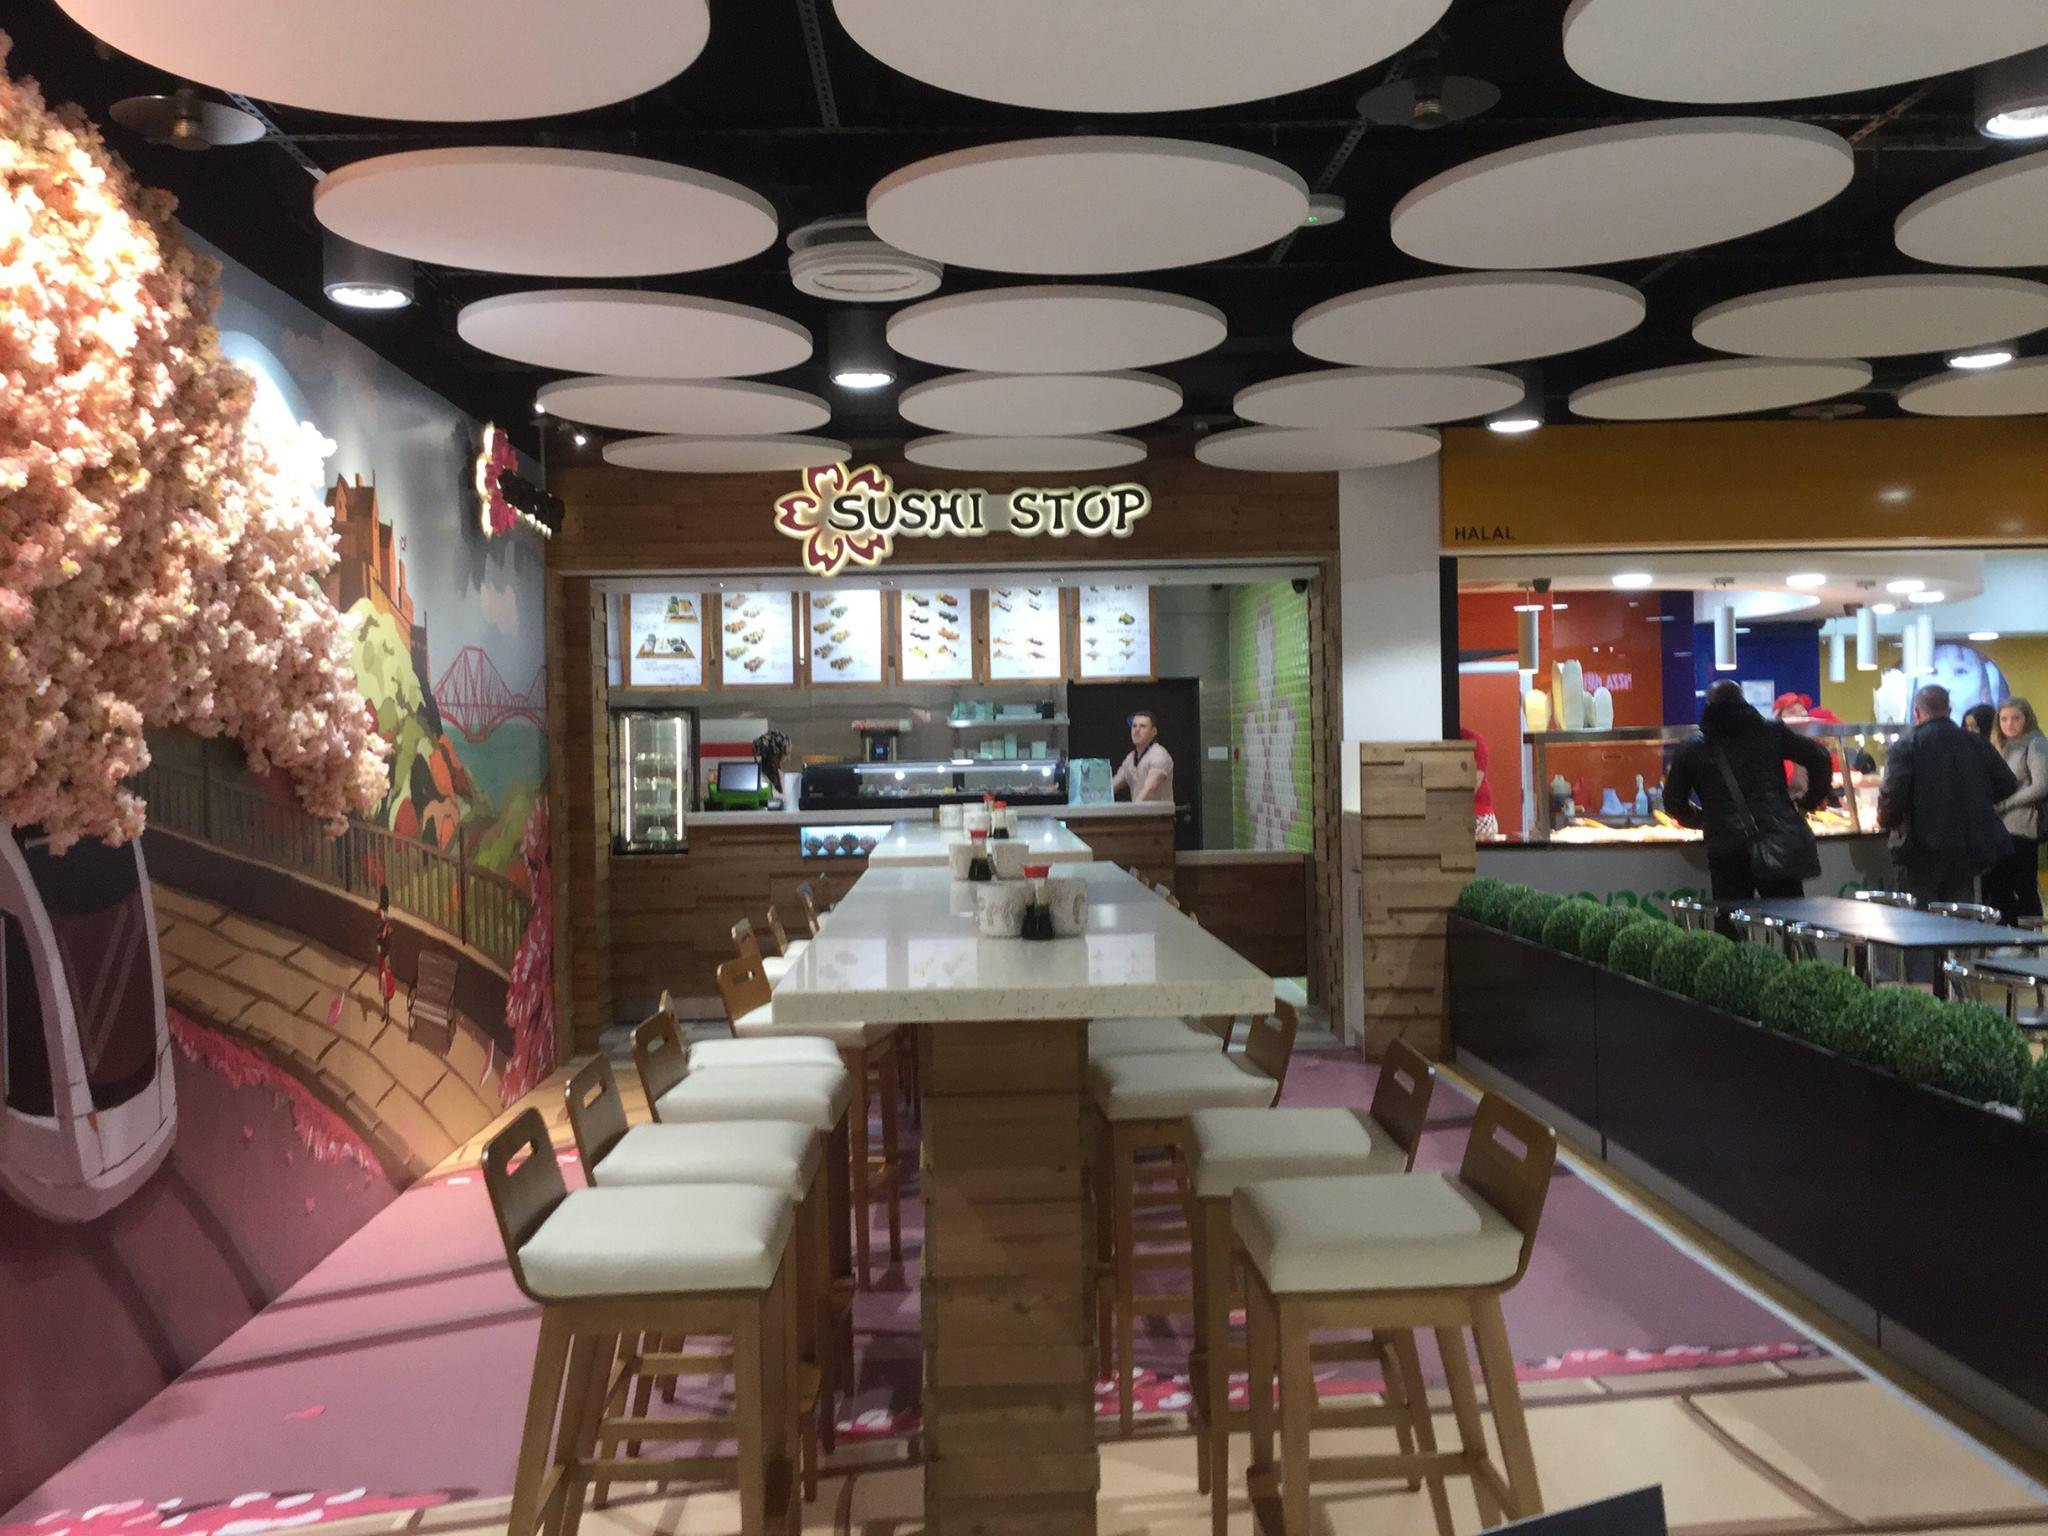 Sushi Stop restaurant Shopfitting Scotland UK